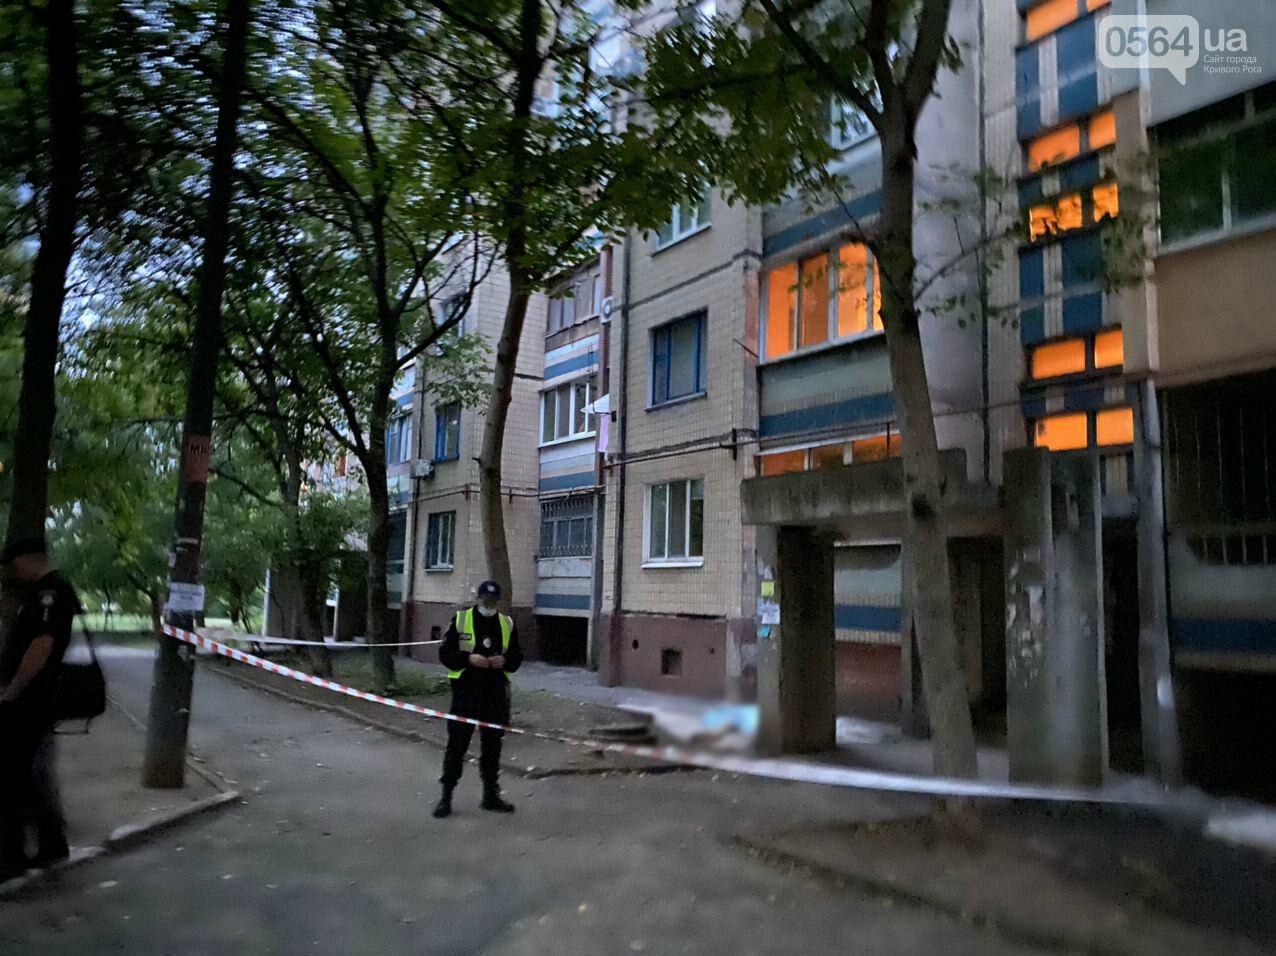 В Кривом Роге погиб мужчина, упавший с 5 этажа жилого дома, - ФОТО 18+, фото-3